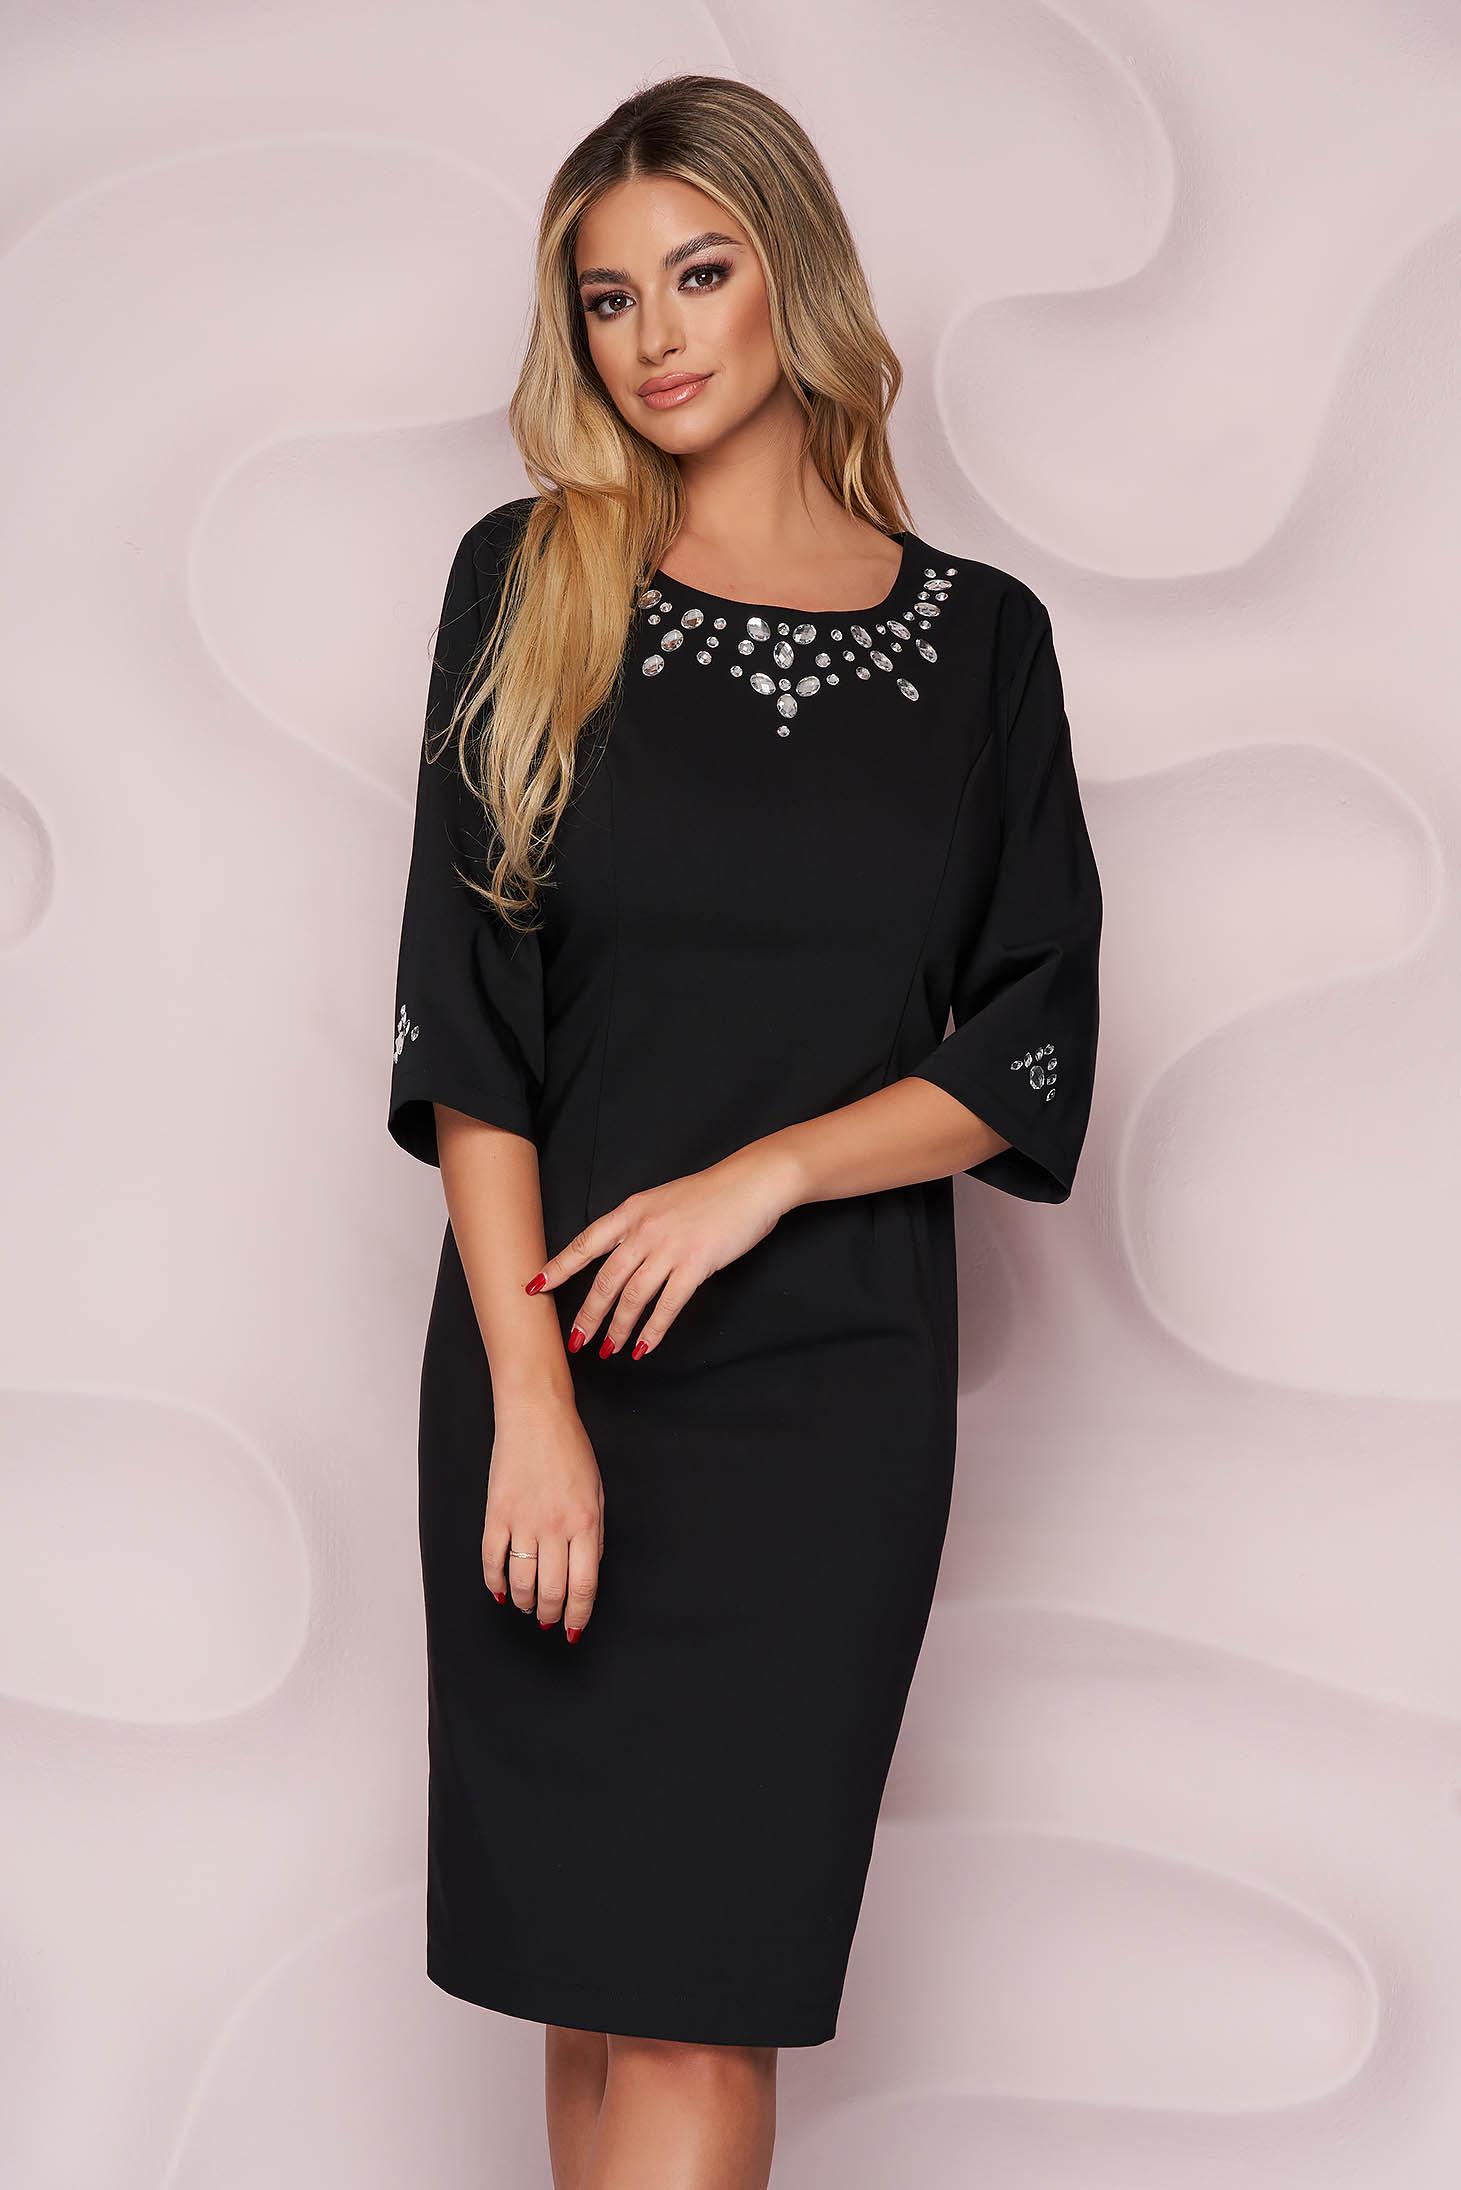 Black dress elegant straight midi cloth with crystal embellished details nonelastic fabric